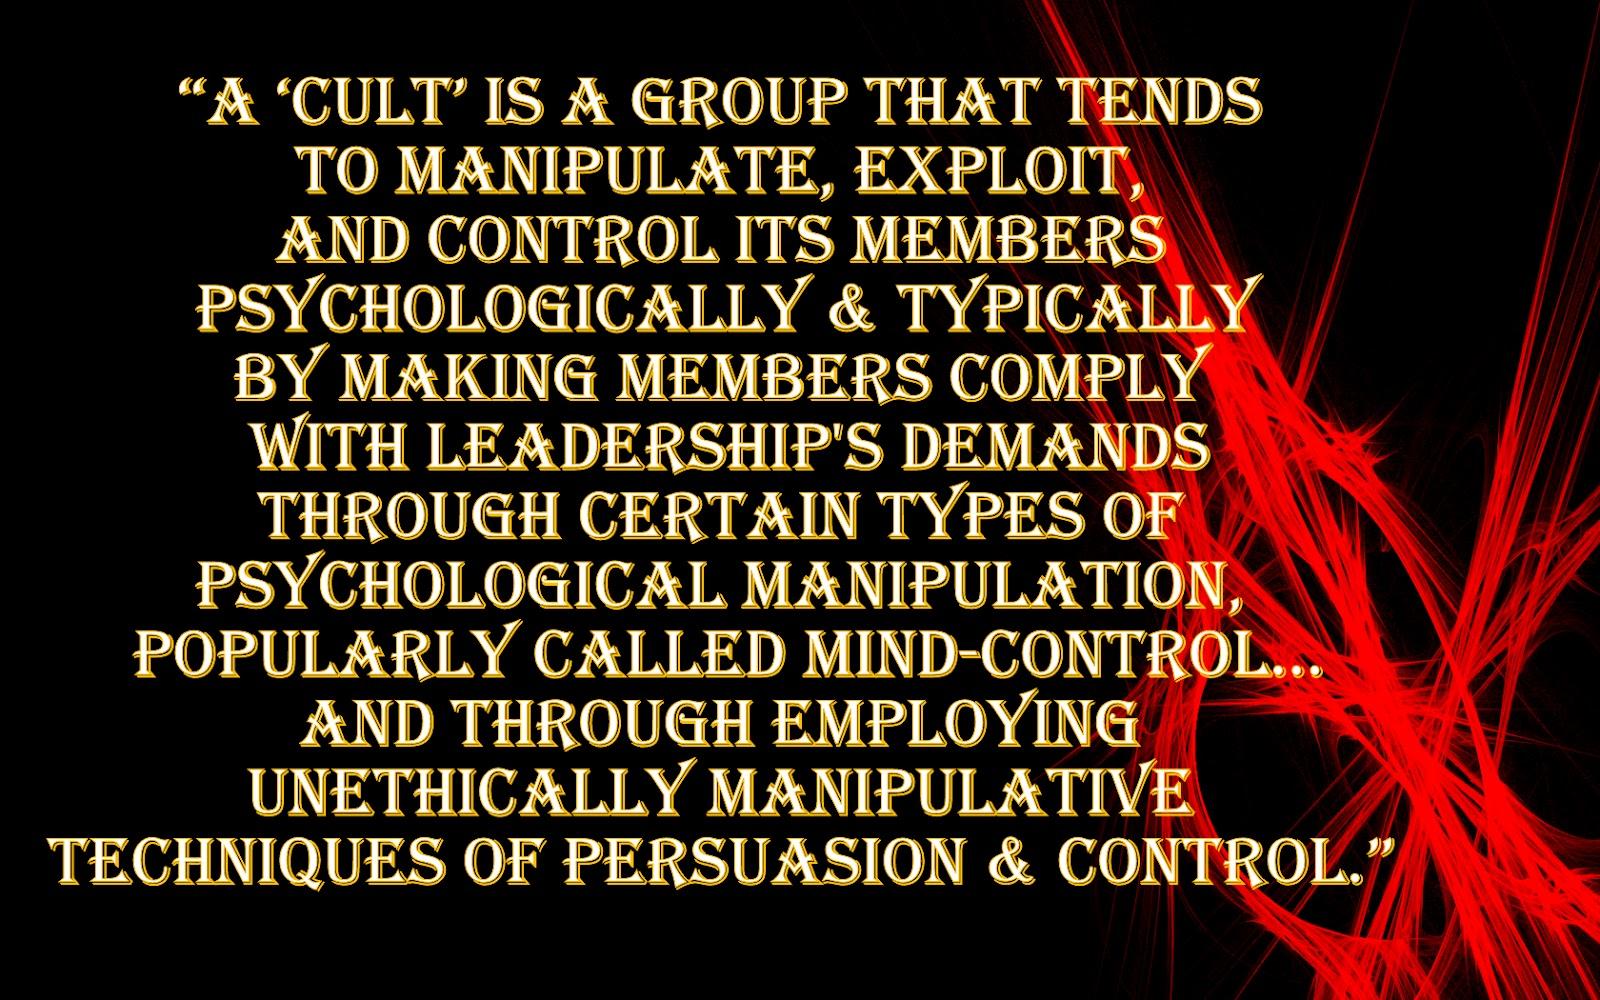 Understanding Mind Control & Exploitive Groups